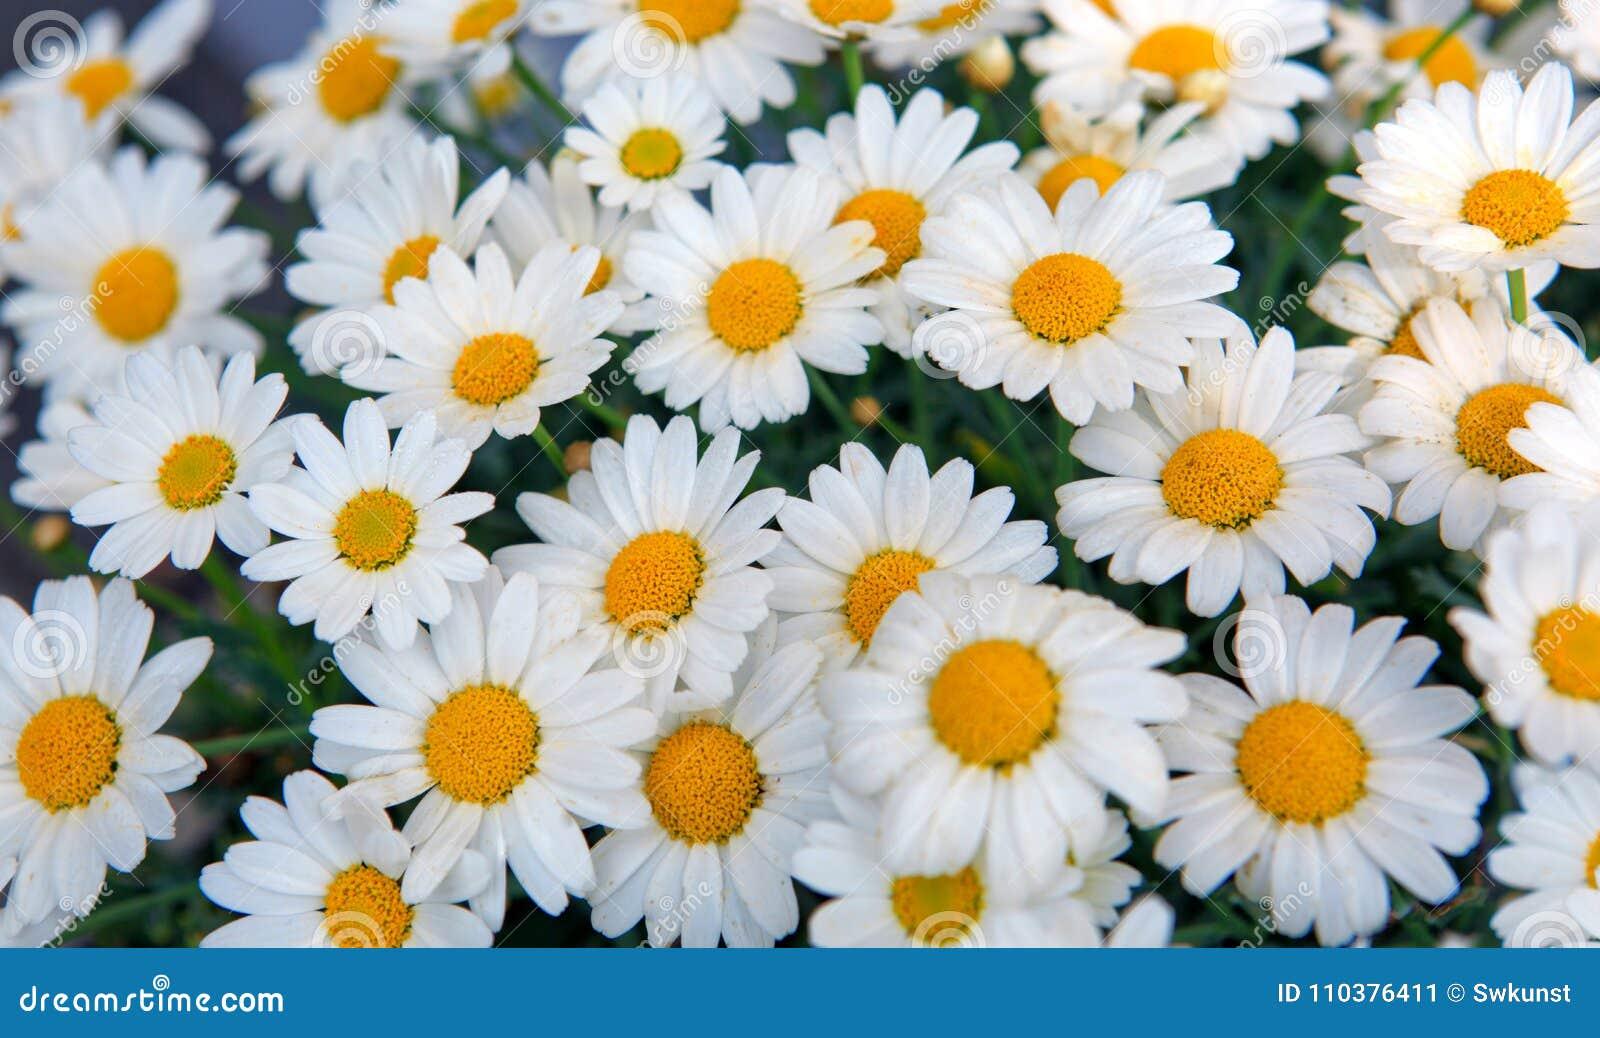 macro of white daisies flowers stock image image of garden